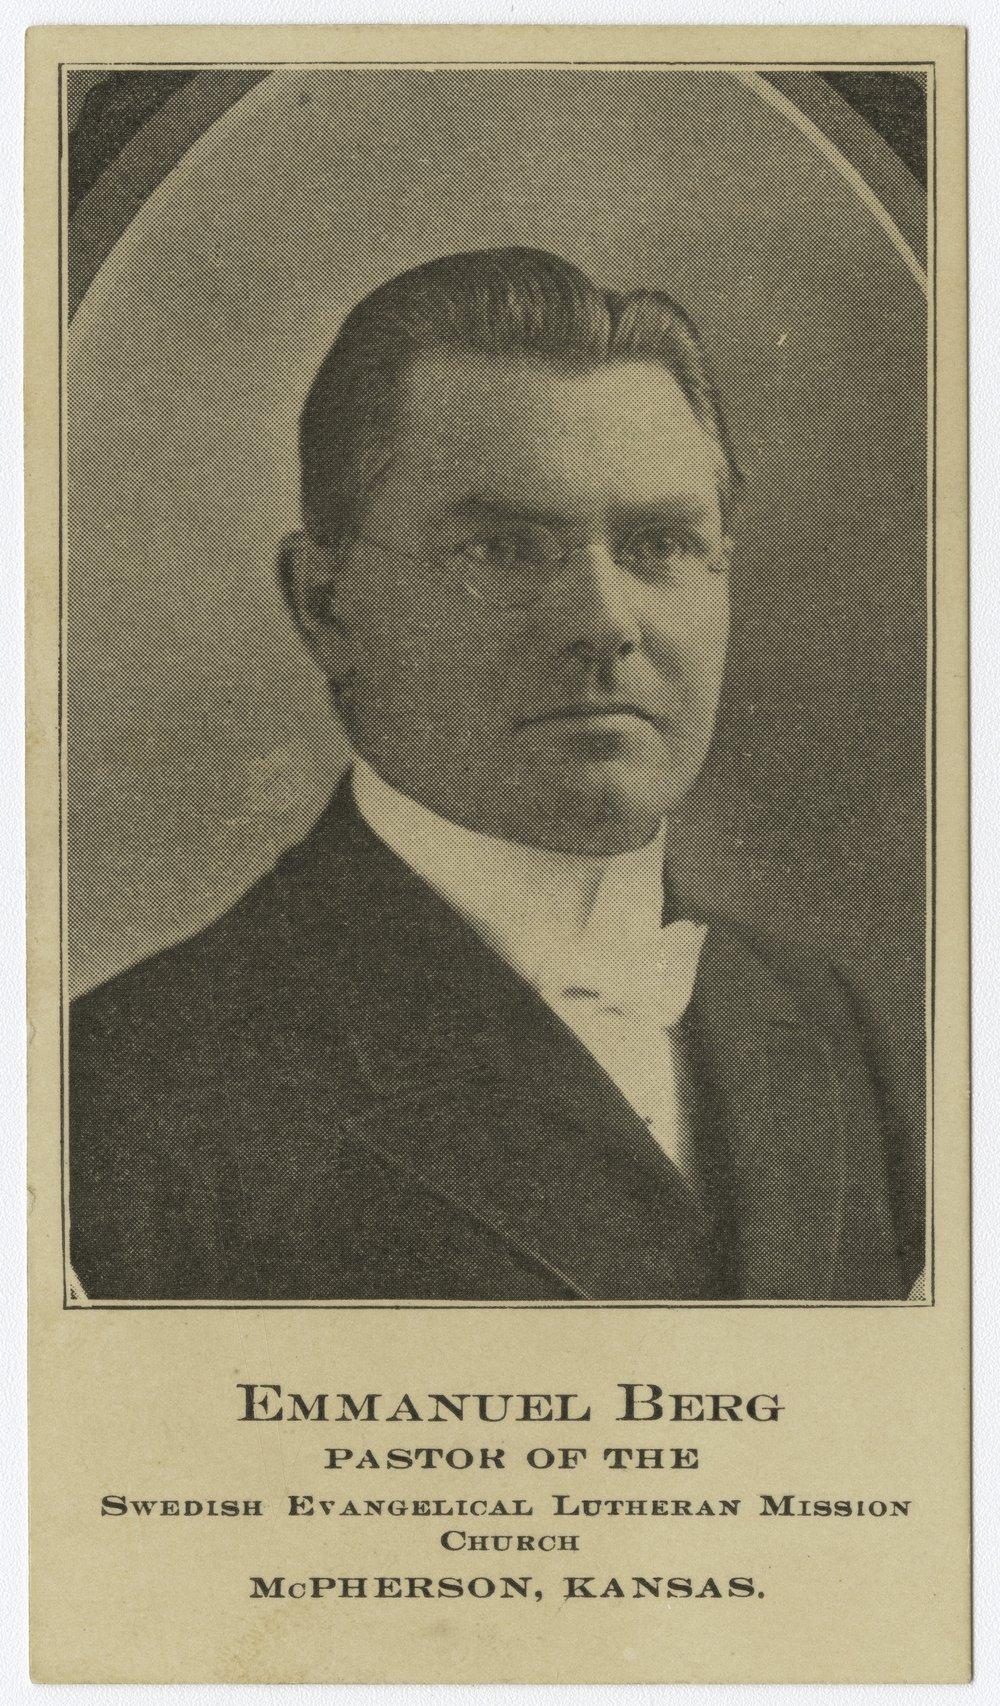 Emmanuel Berg calling card, McPherson, Kansas - 1